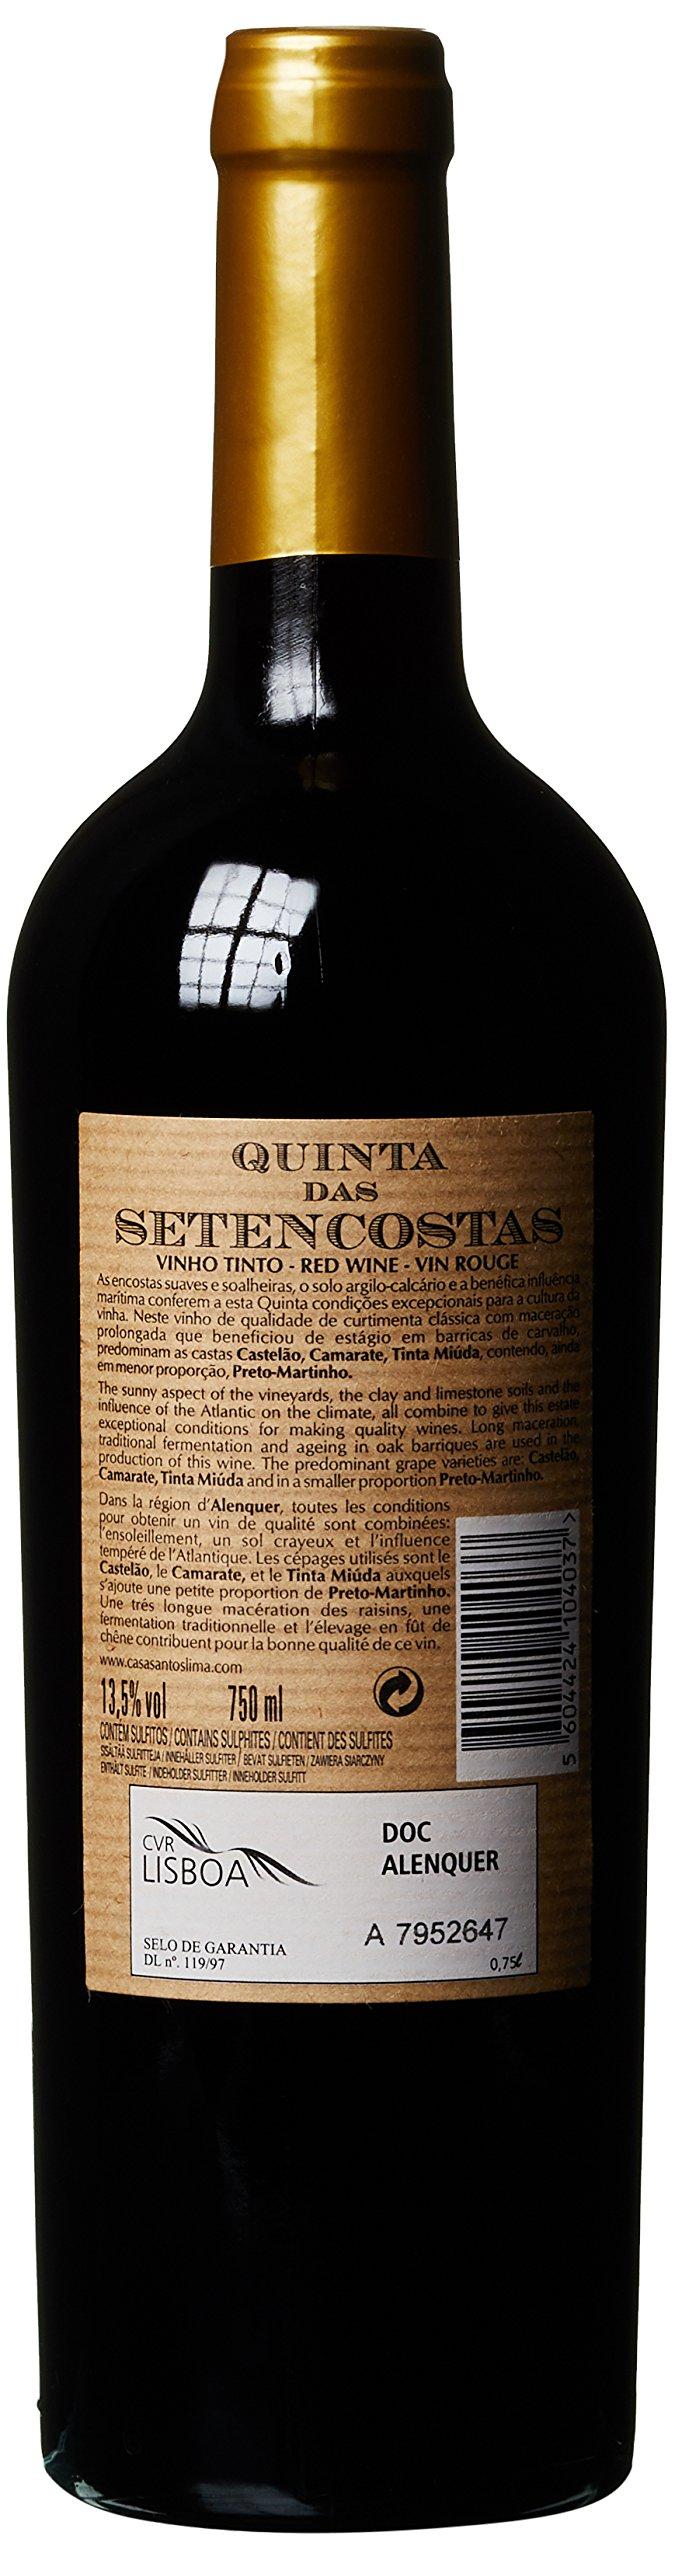 Quinta-da-Boavista-Setencostas-Tinto-DOC-Cuve-2015-Trocken-1-x-075-l